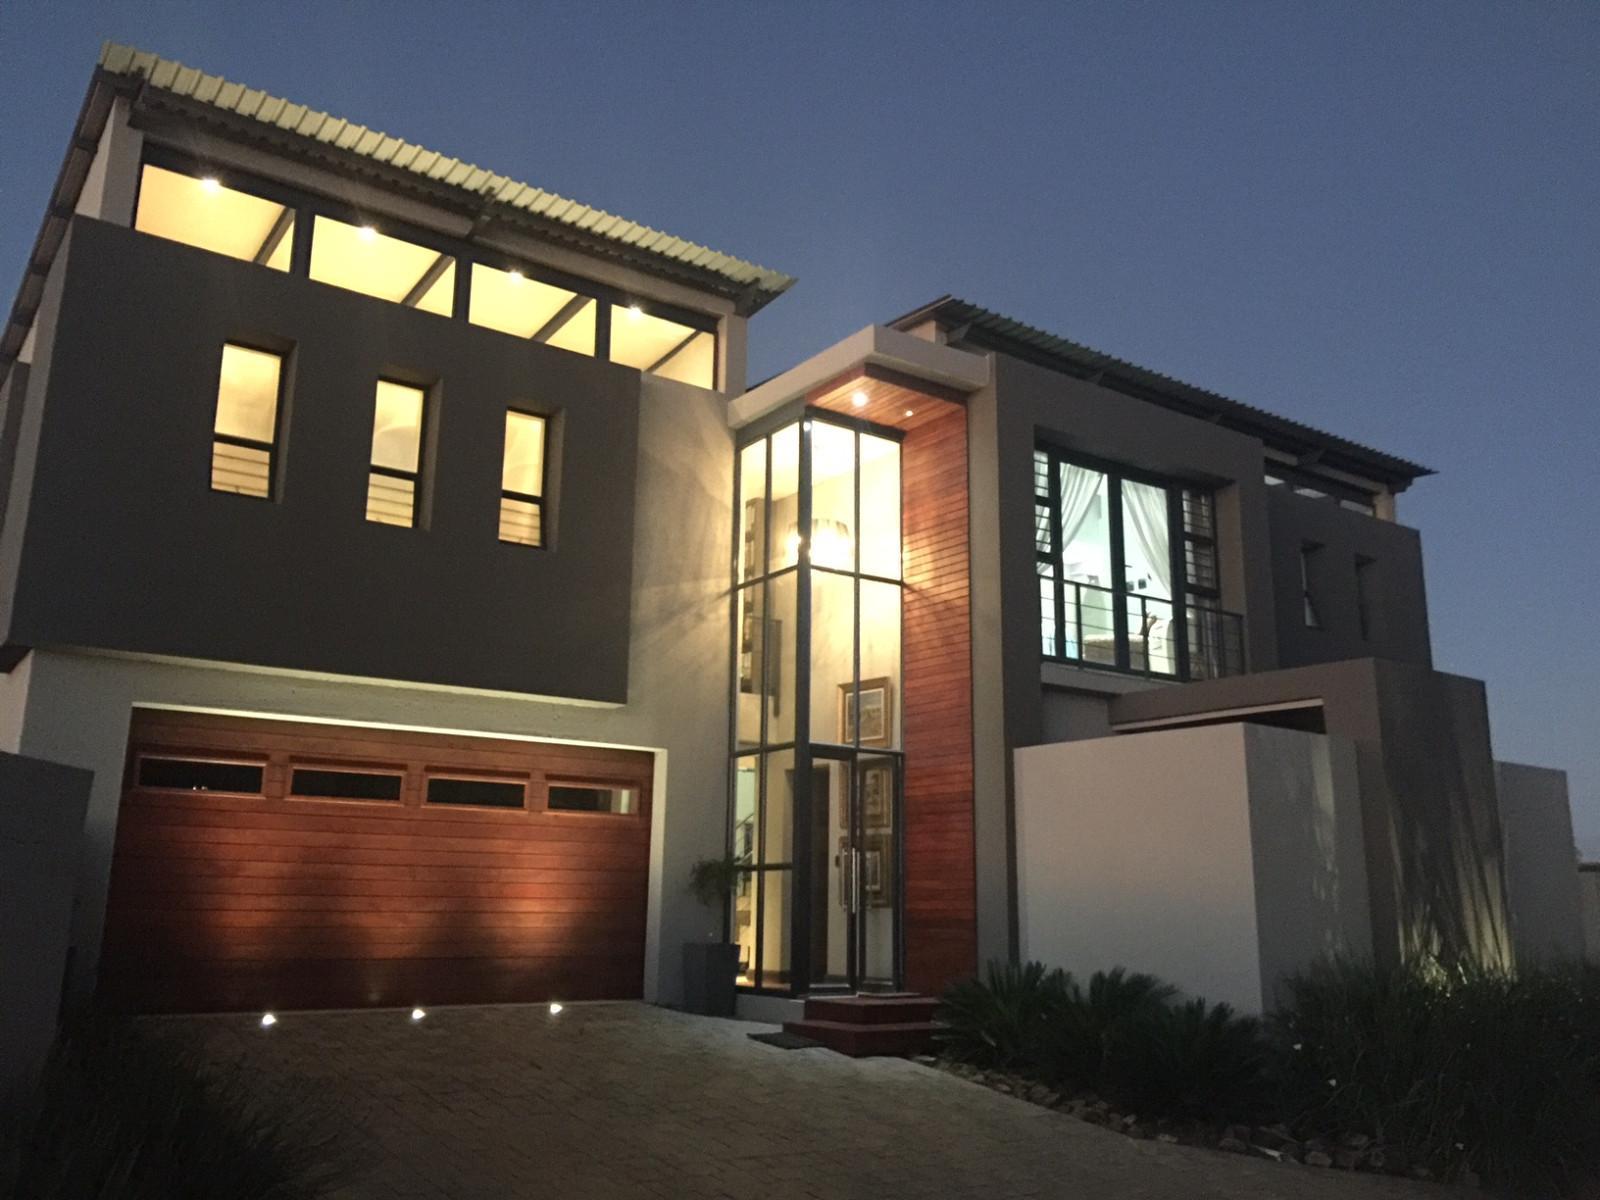 Potchefstroom, Potchefstroom Property  | Houses For Sale Potchefstroom, POTCHEFSTROOM, House 3 bedrooms property for sale Price:2,995,000